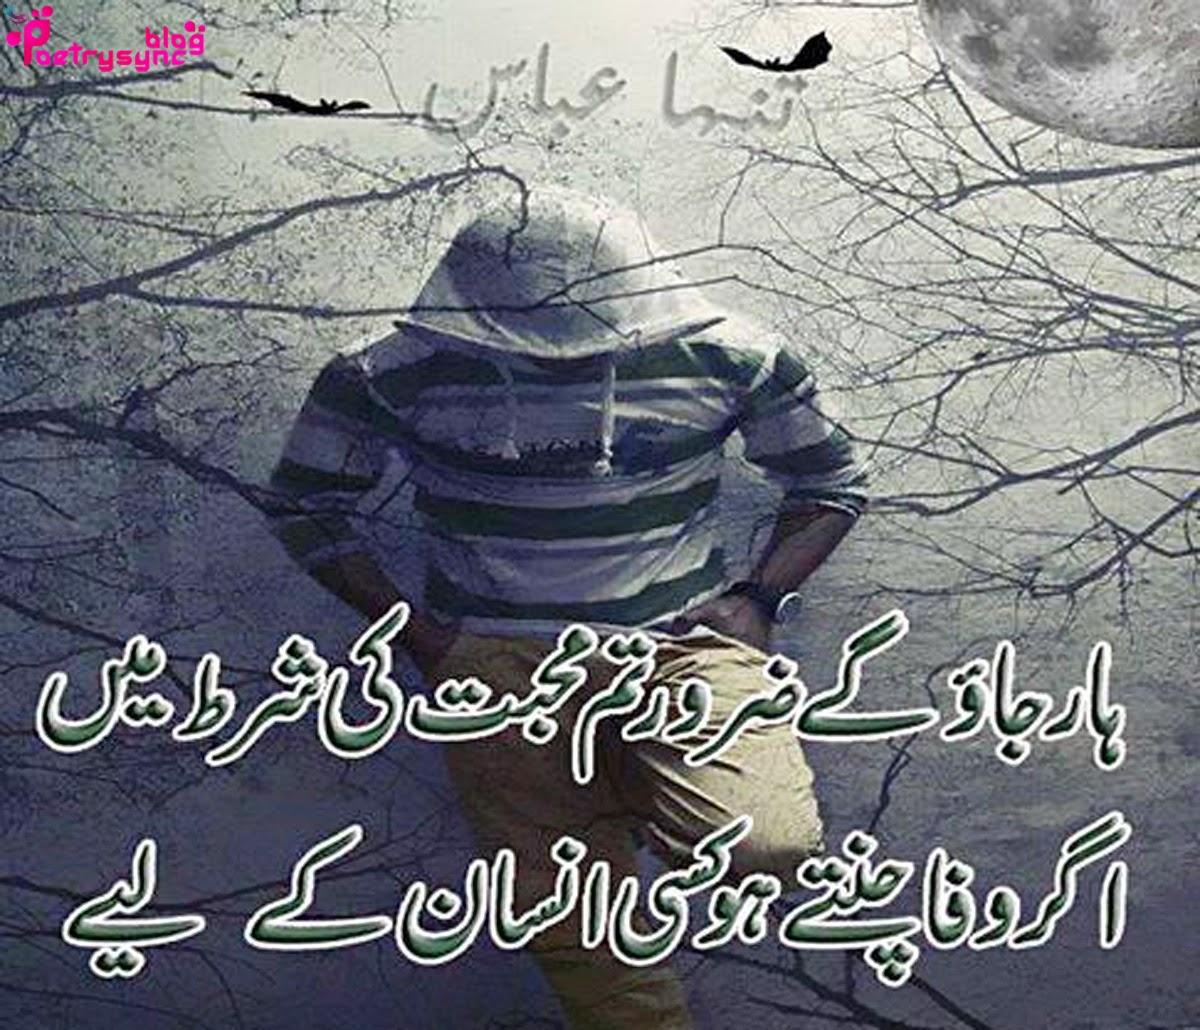 Poetry-Mohabbat-Urdu-Images-Poetry-Shayari-for-Facebook-Timeline-Posts-wallpaper-wp5801446